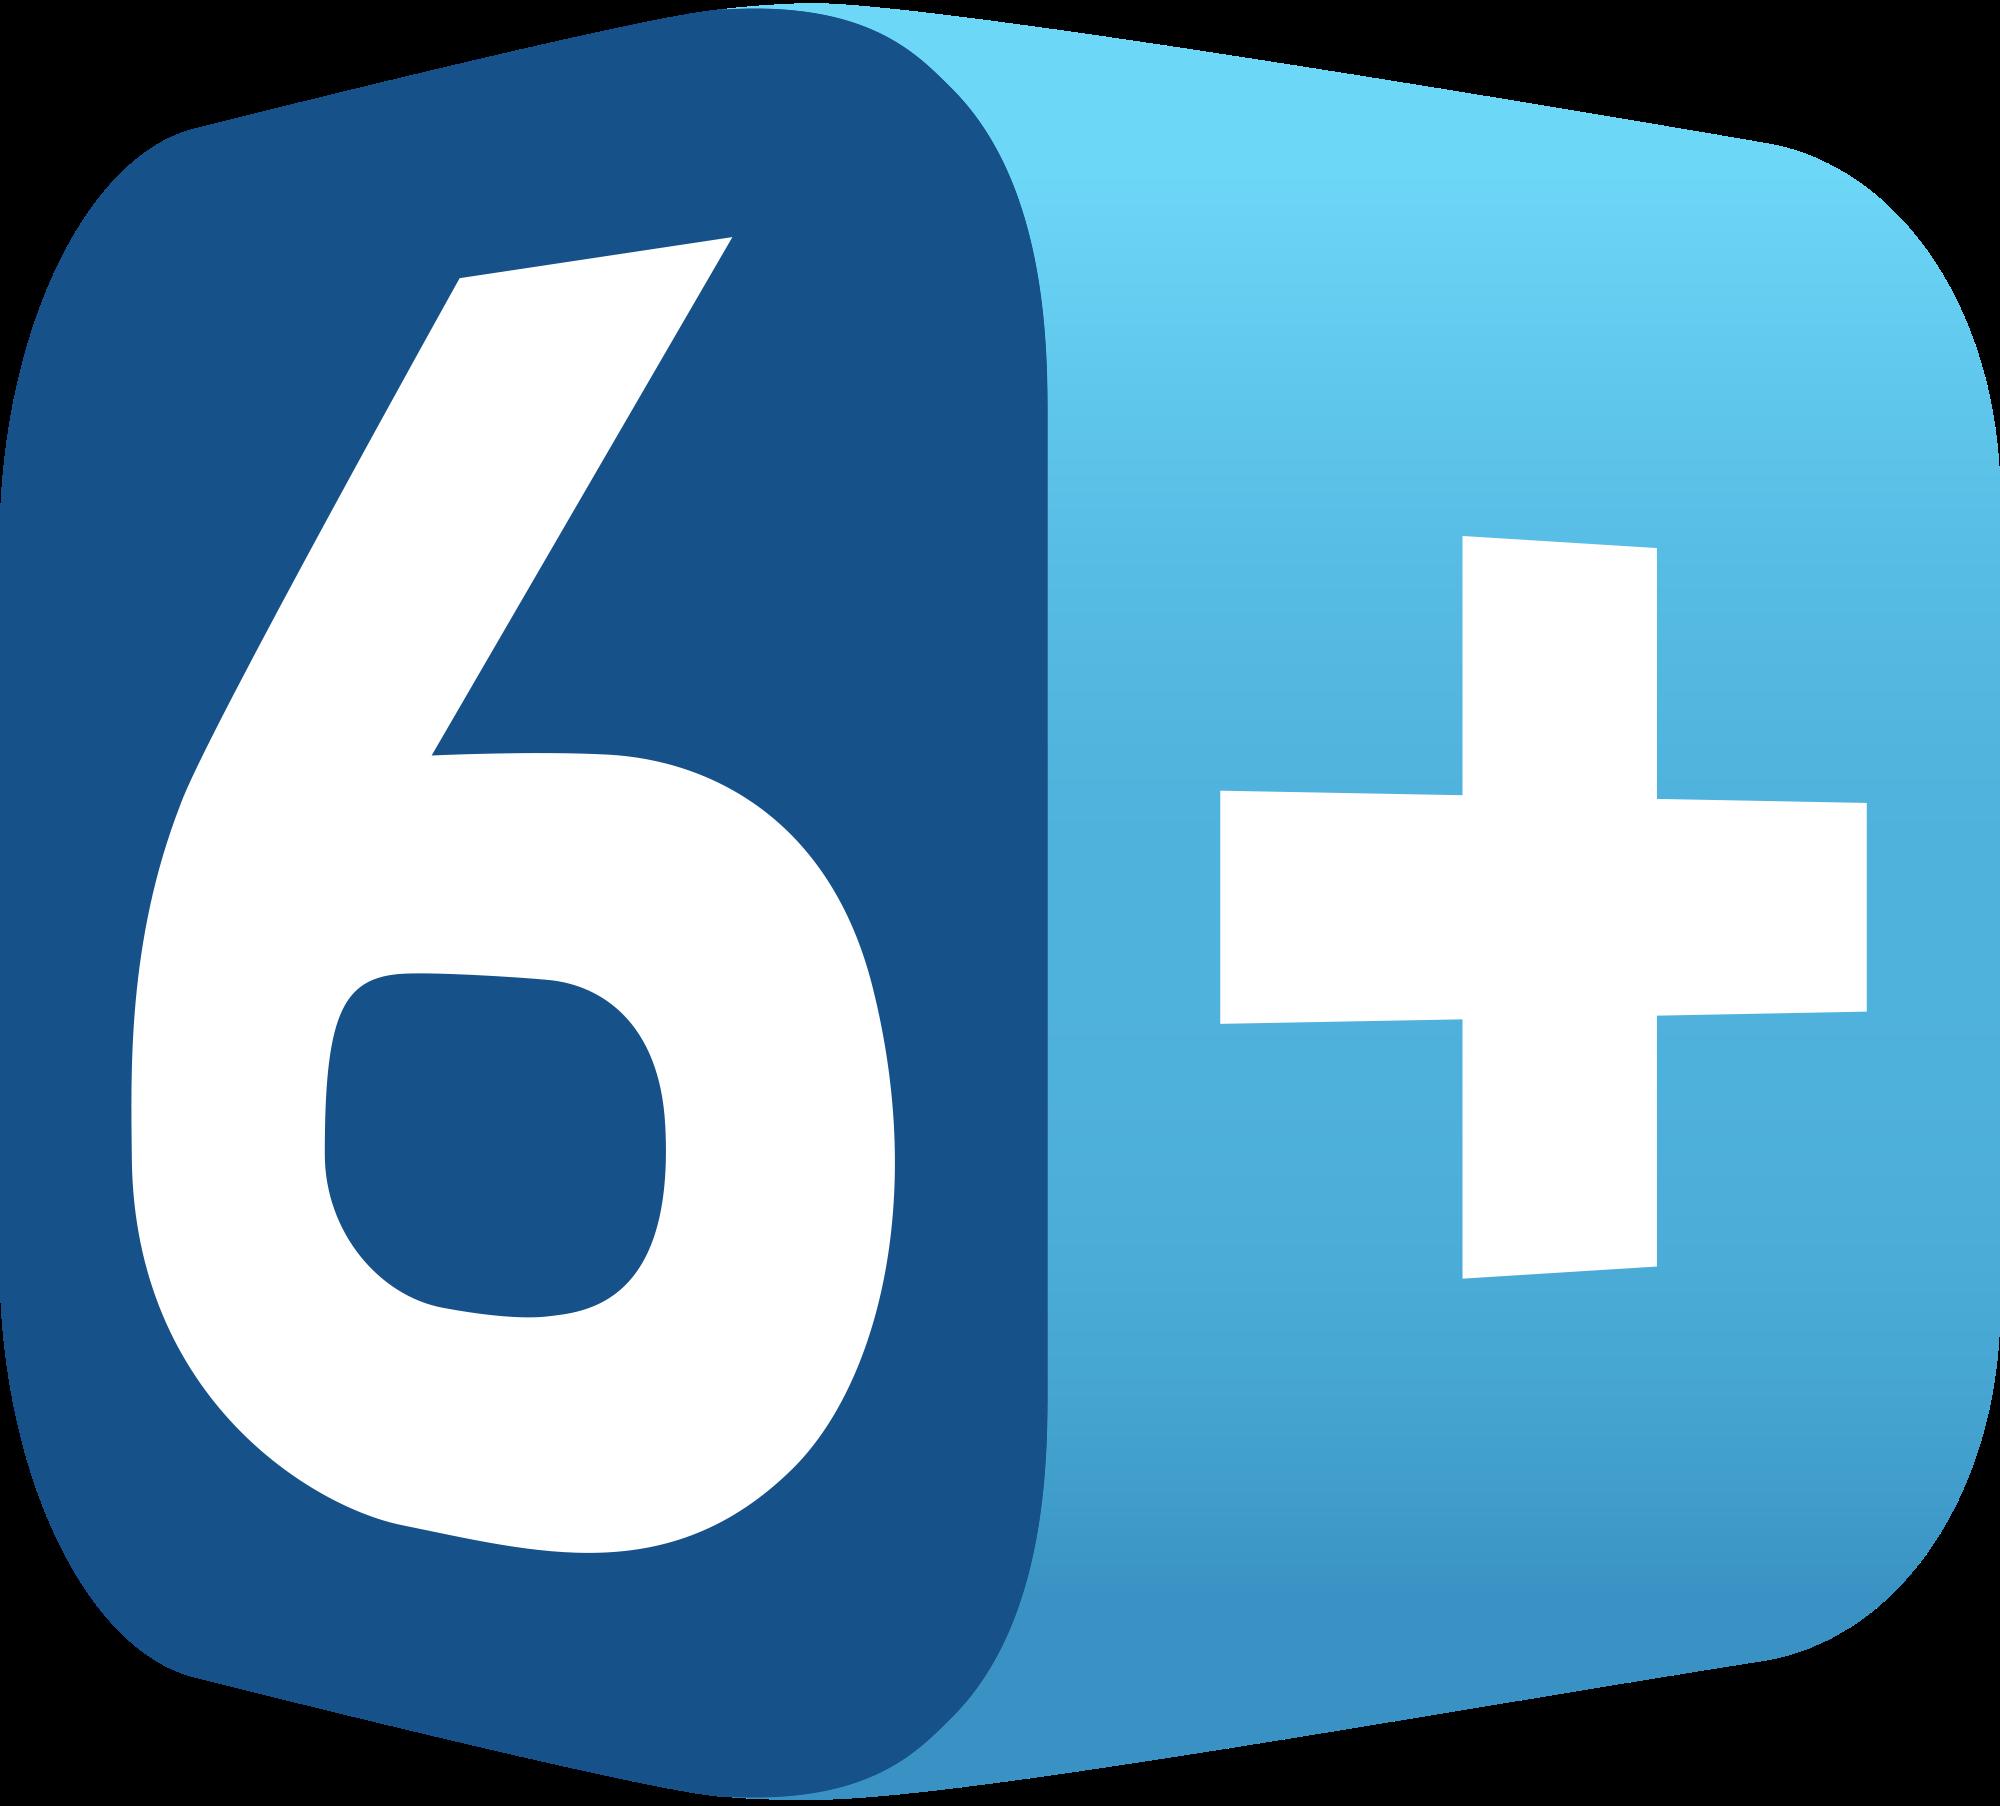 Logo TV 6+